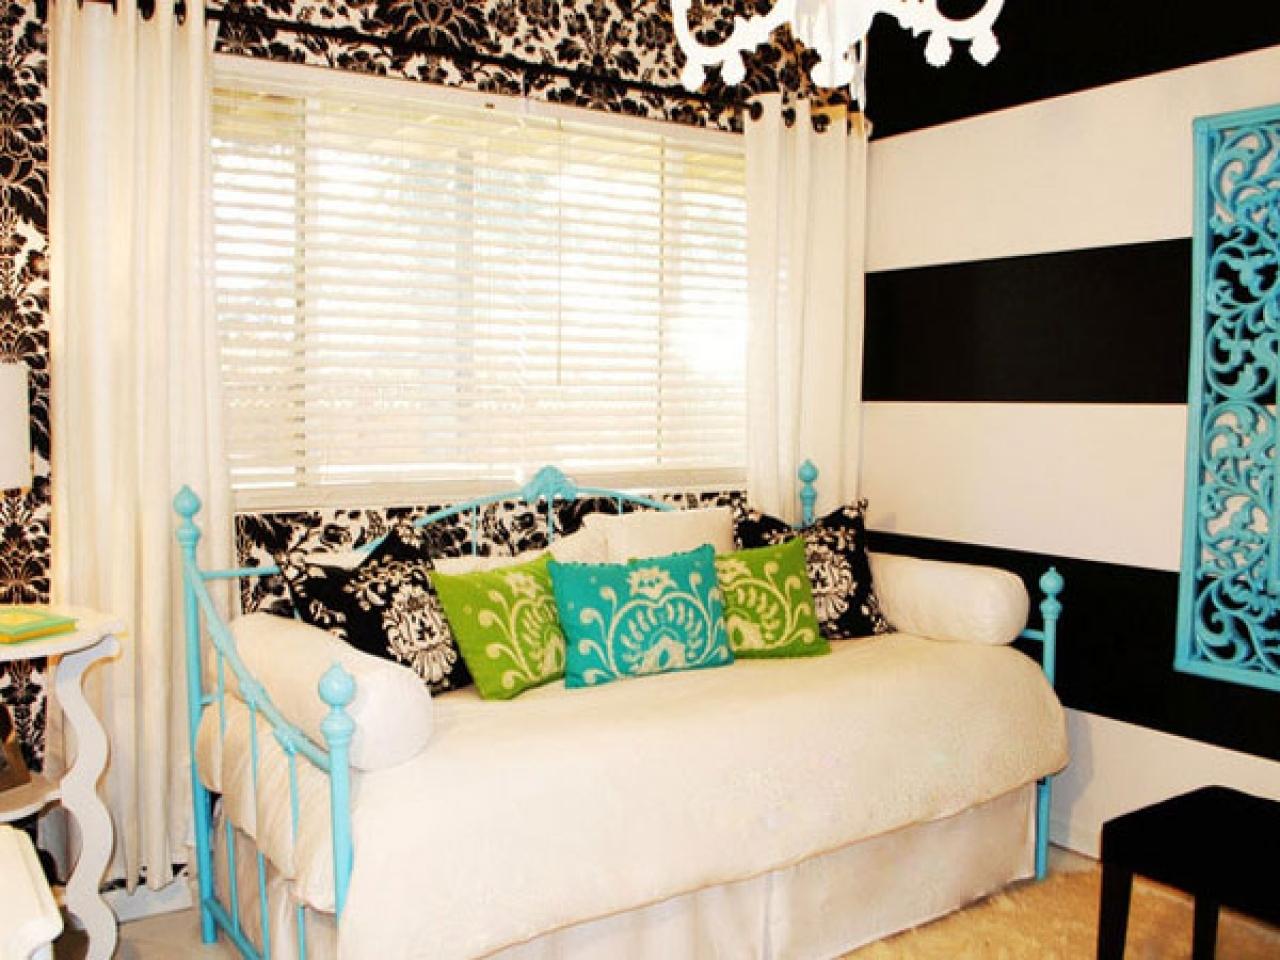 Teenage Girl Bedroom Painting Ideas Teenage Girl Bedroom Wall Contemporary Teenage Girl Bedroom Wall Designs